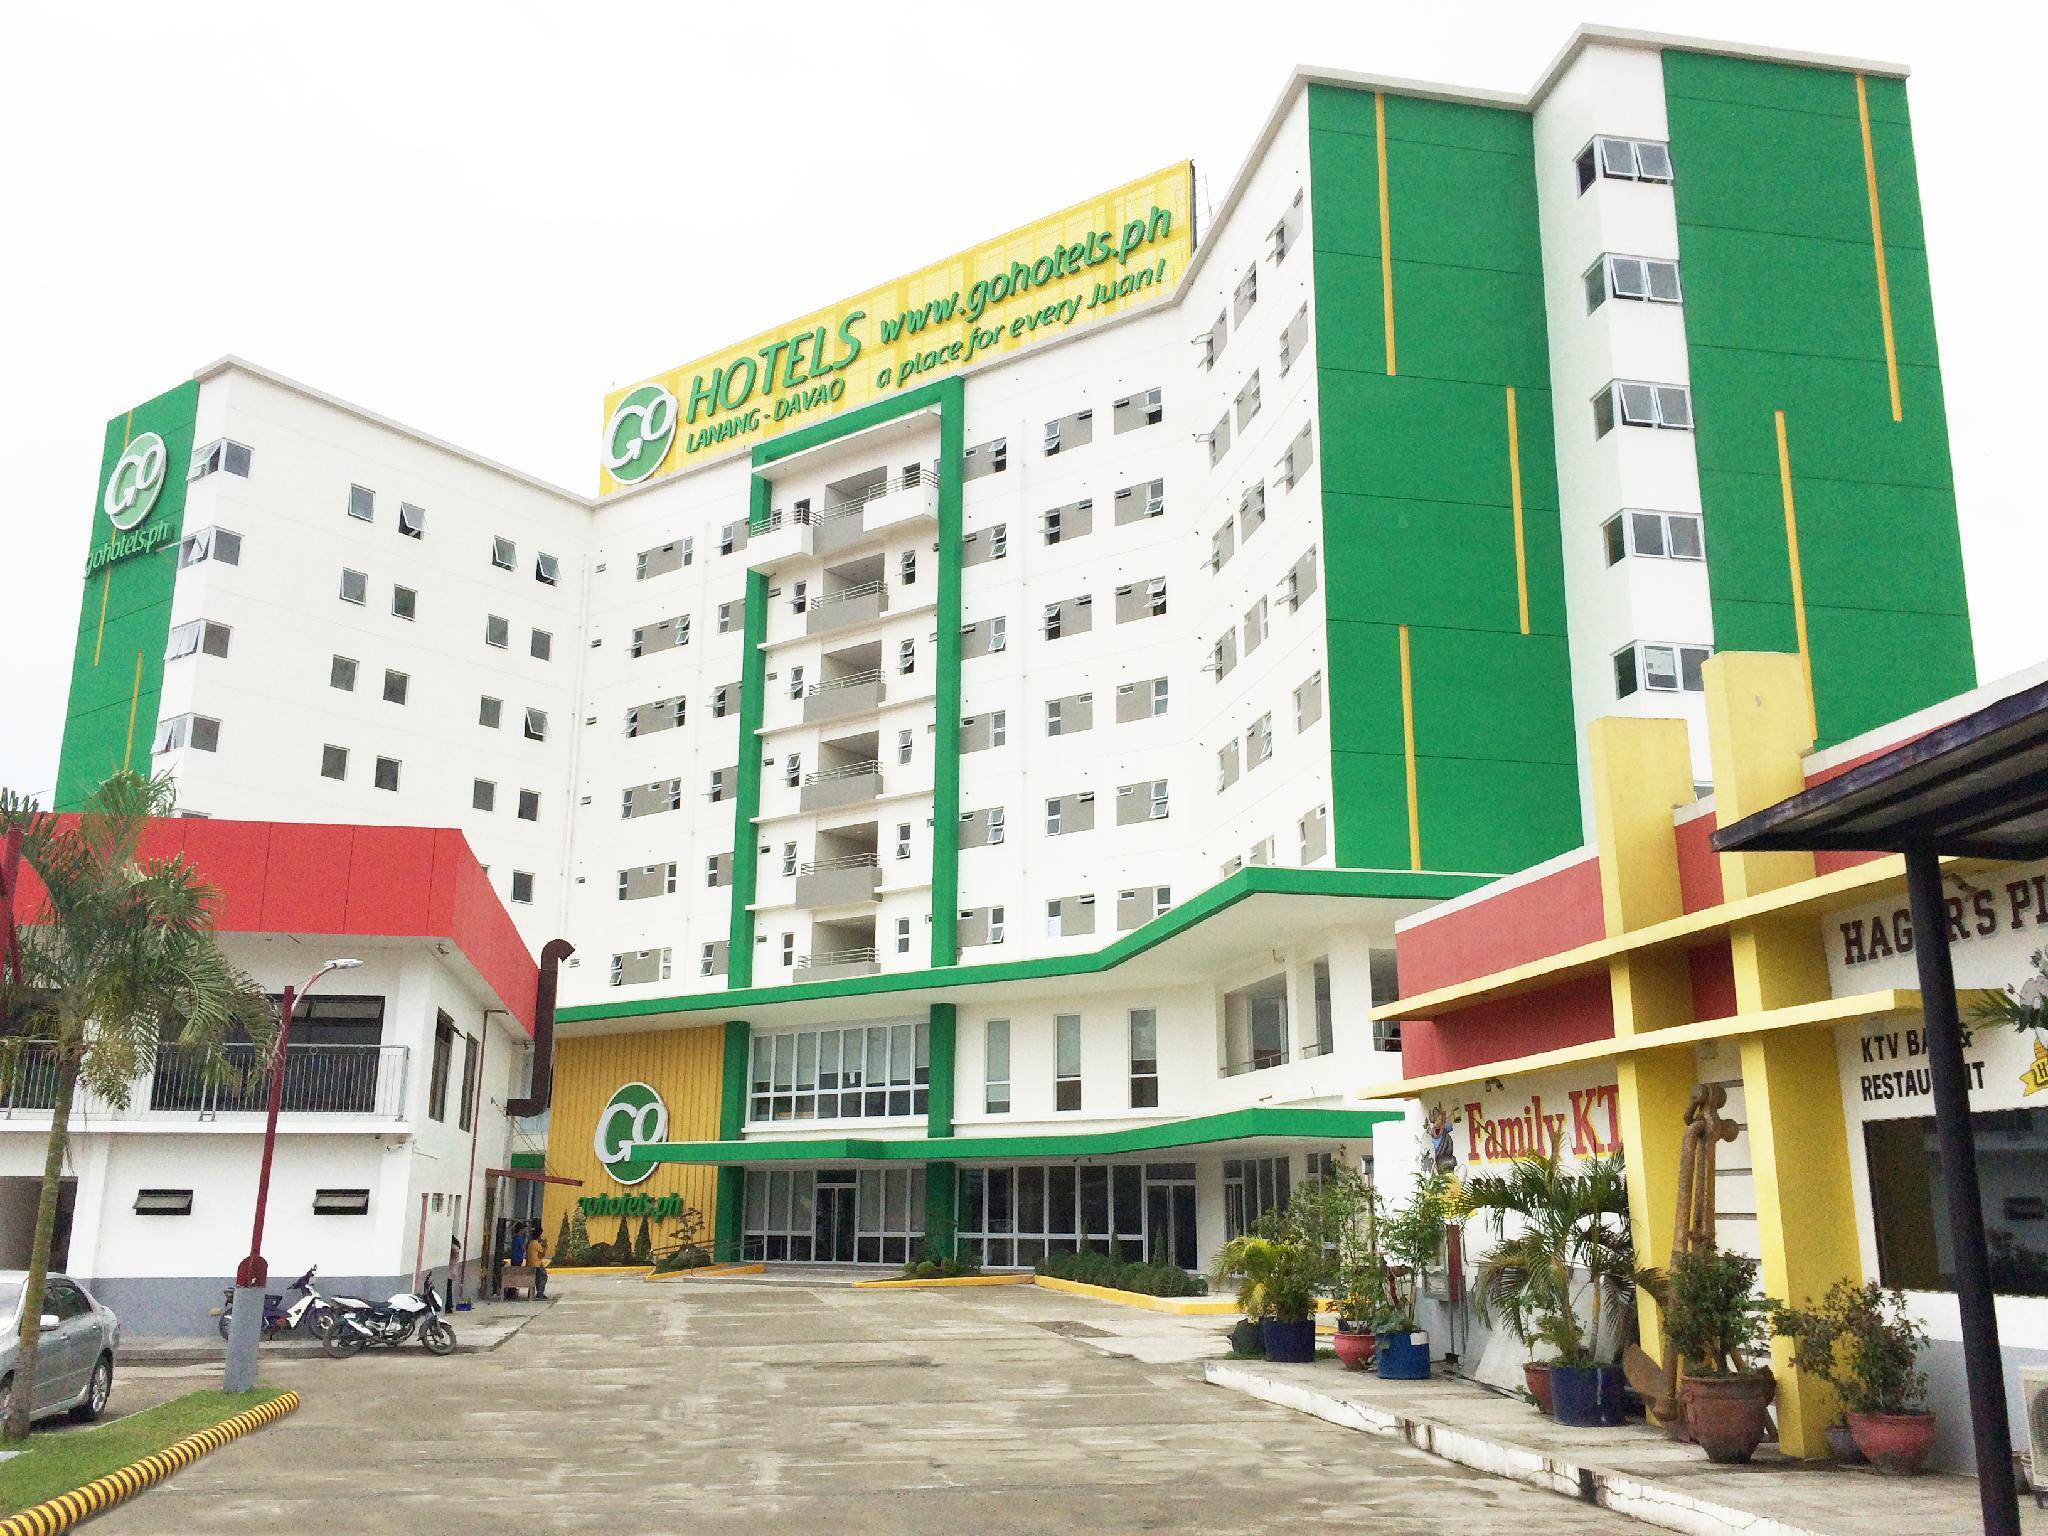 Go Hotel Lanang Davao